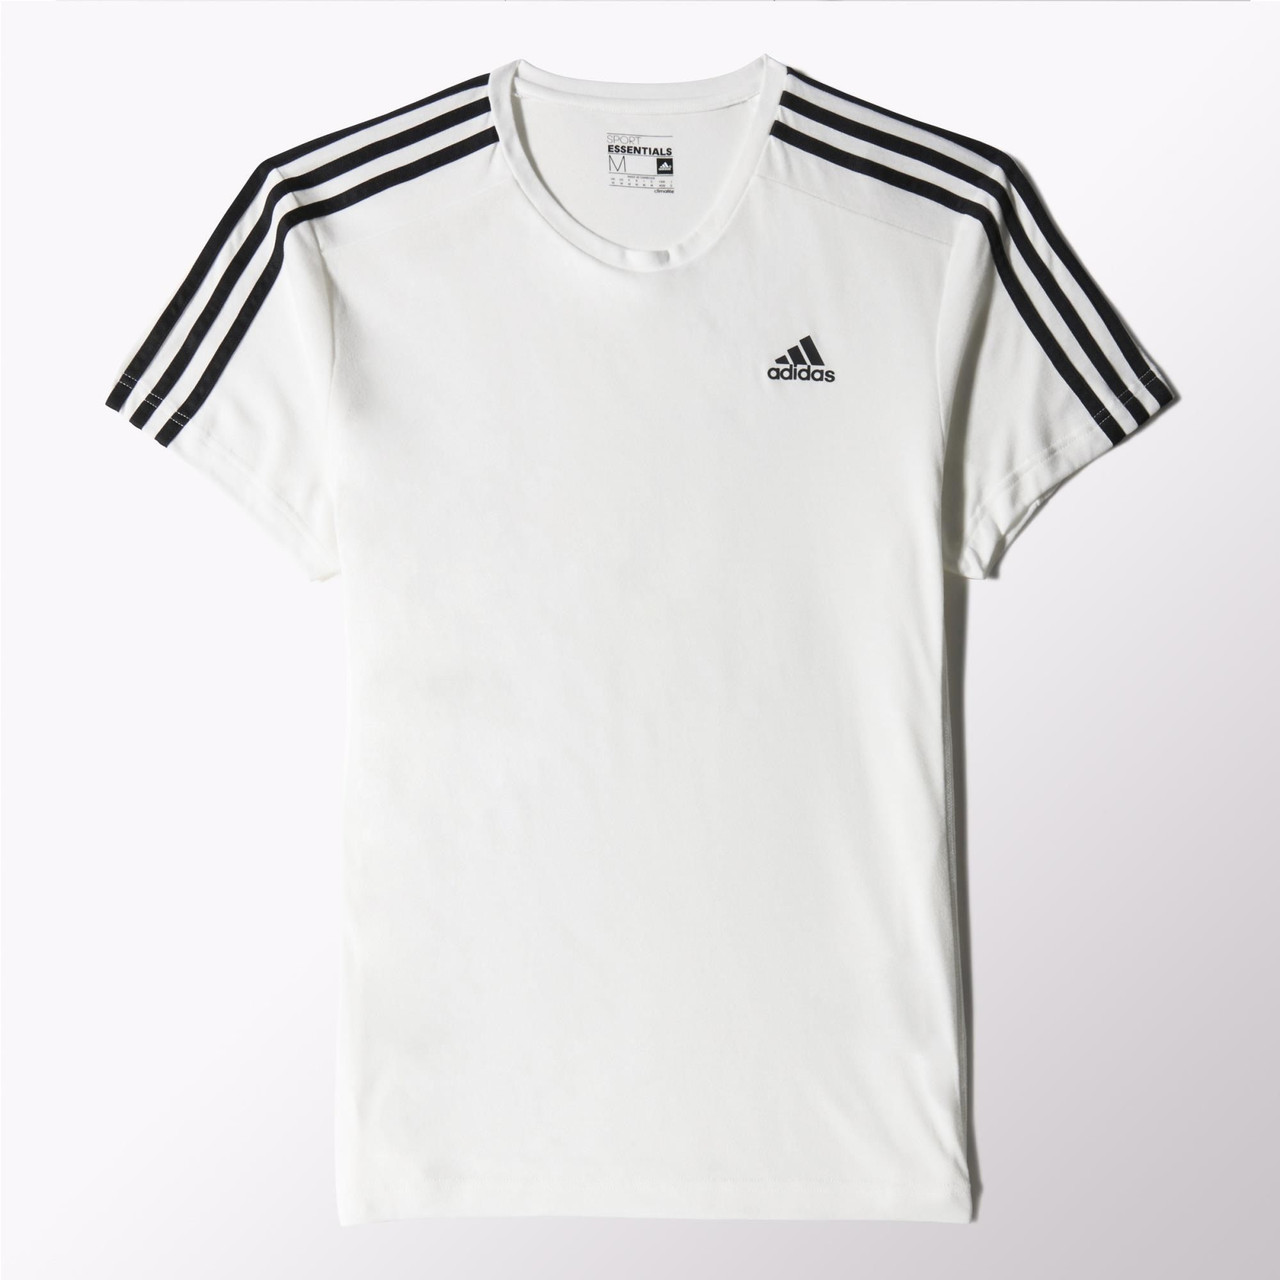 313bac07dd810 Мужская футболка Adidas Sport Essentials 3-Stripes (Артикул: S17661) -  Интернет-